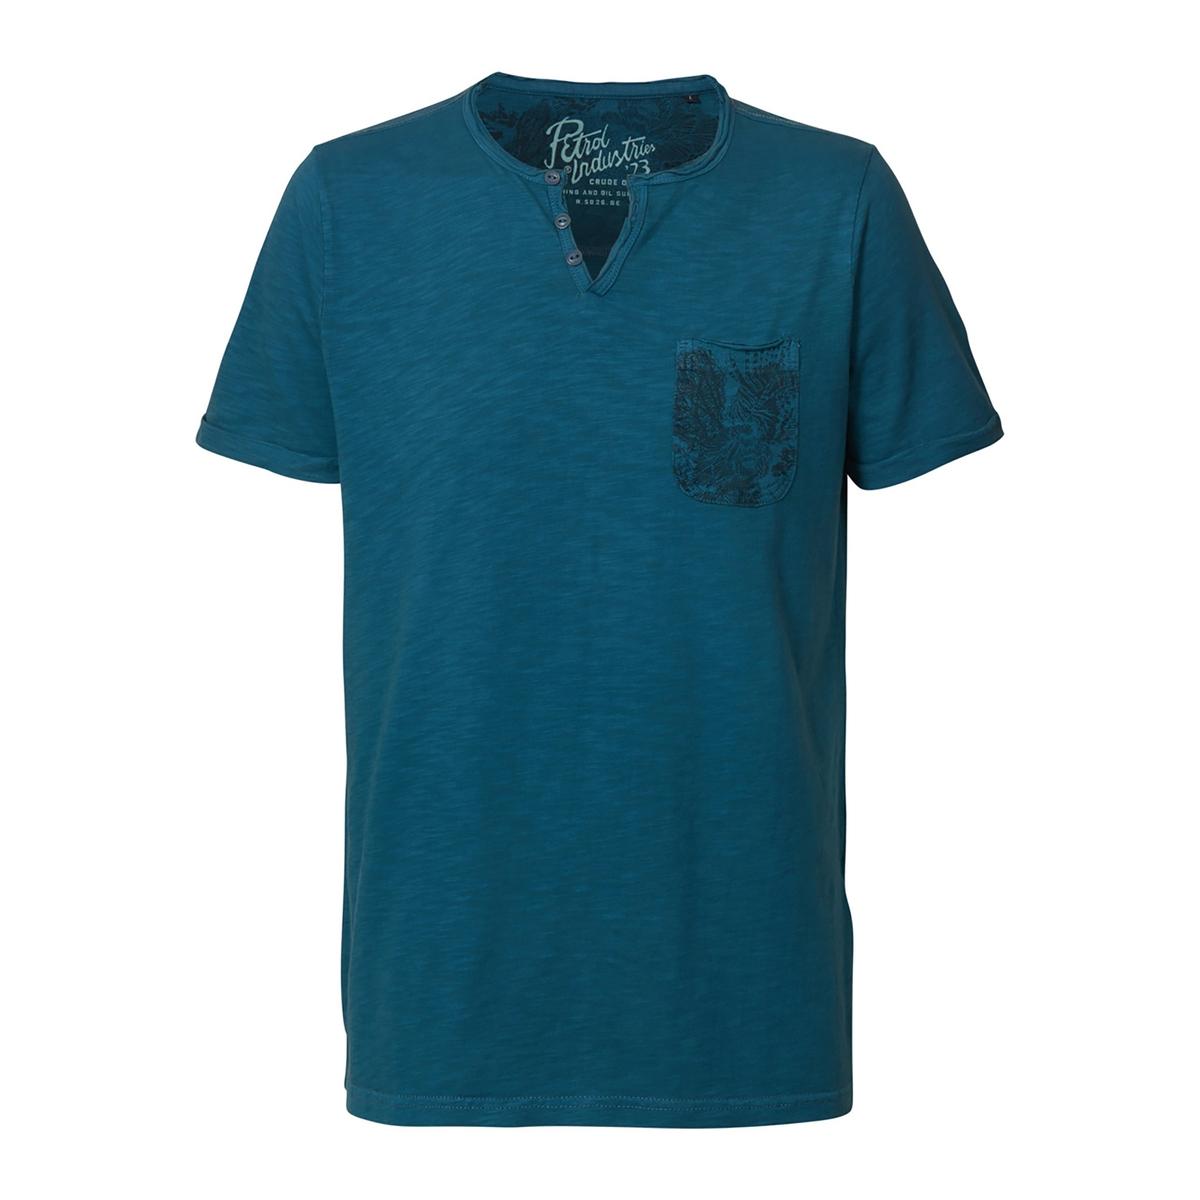 Футболка однотонная с короткими рукавами футболка однотонная с открытым плечом